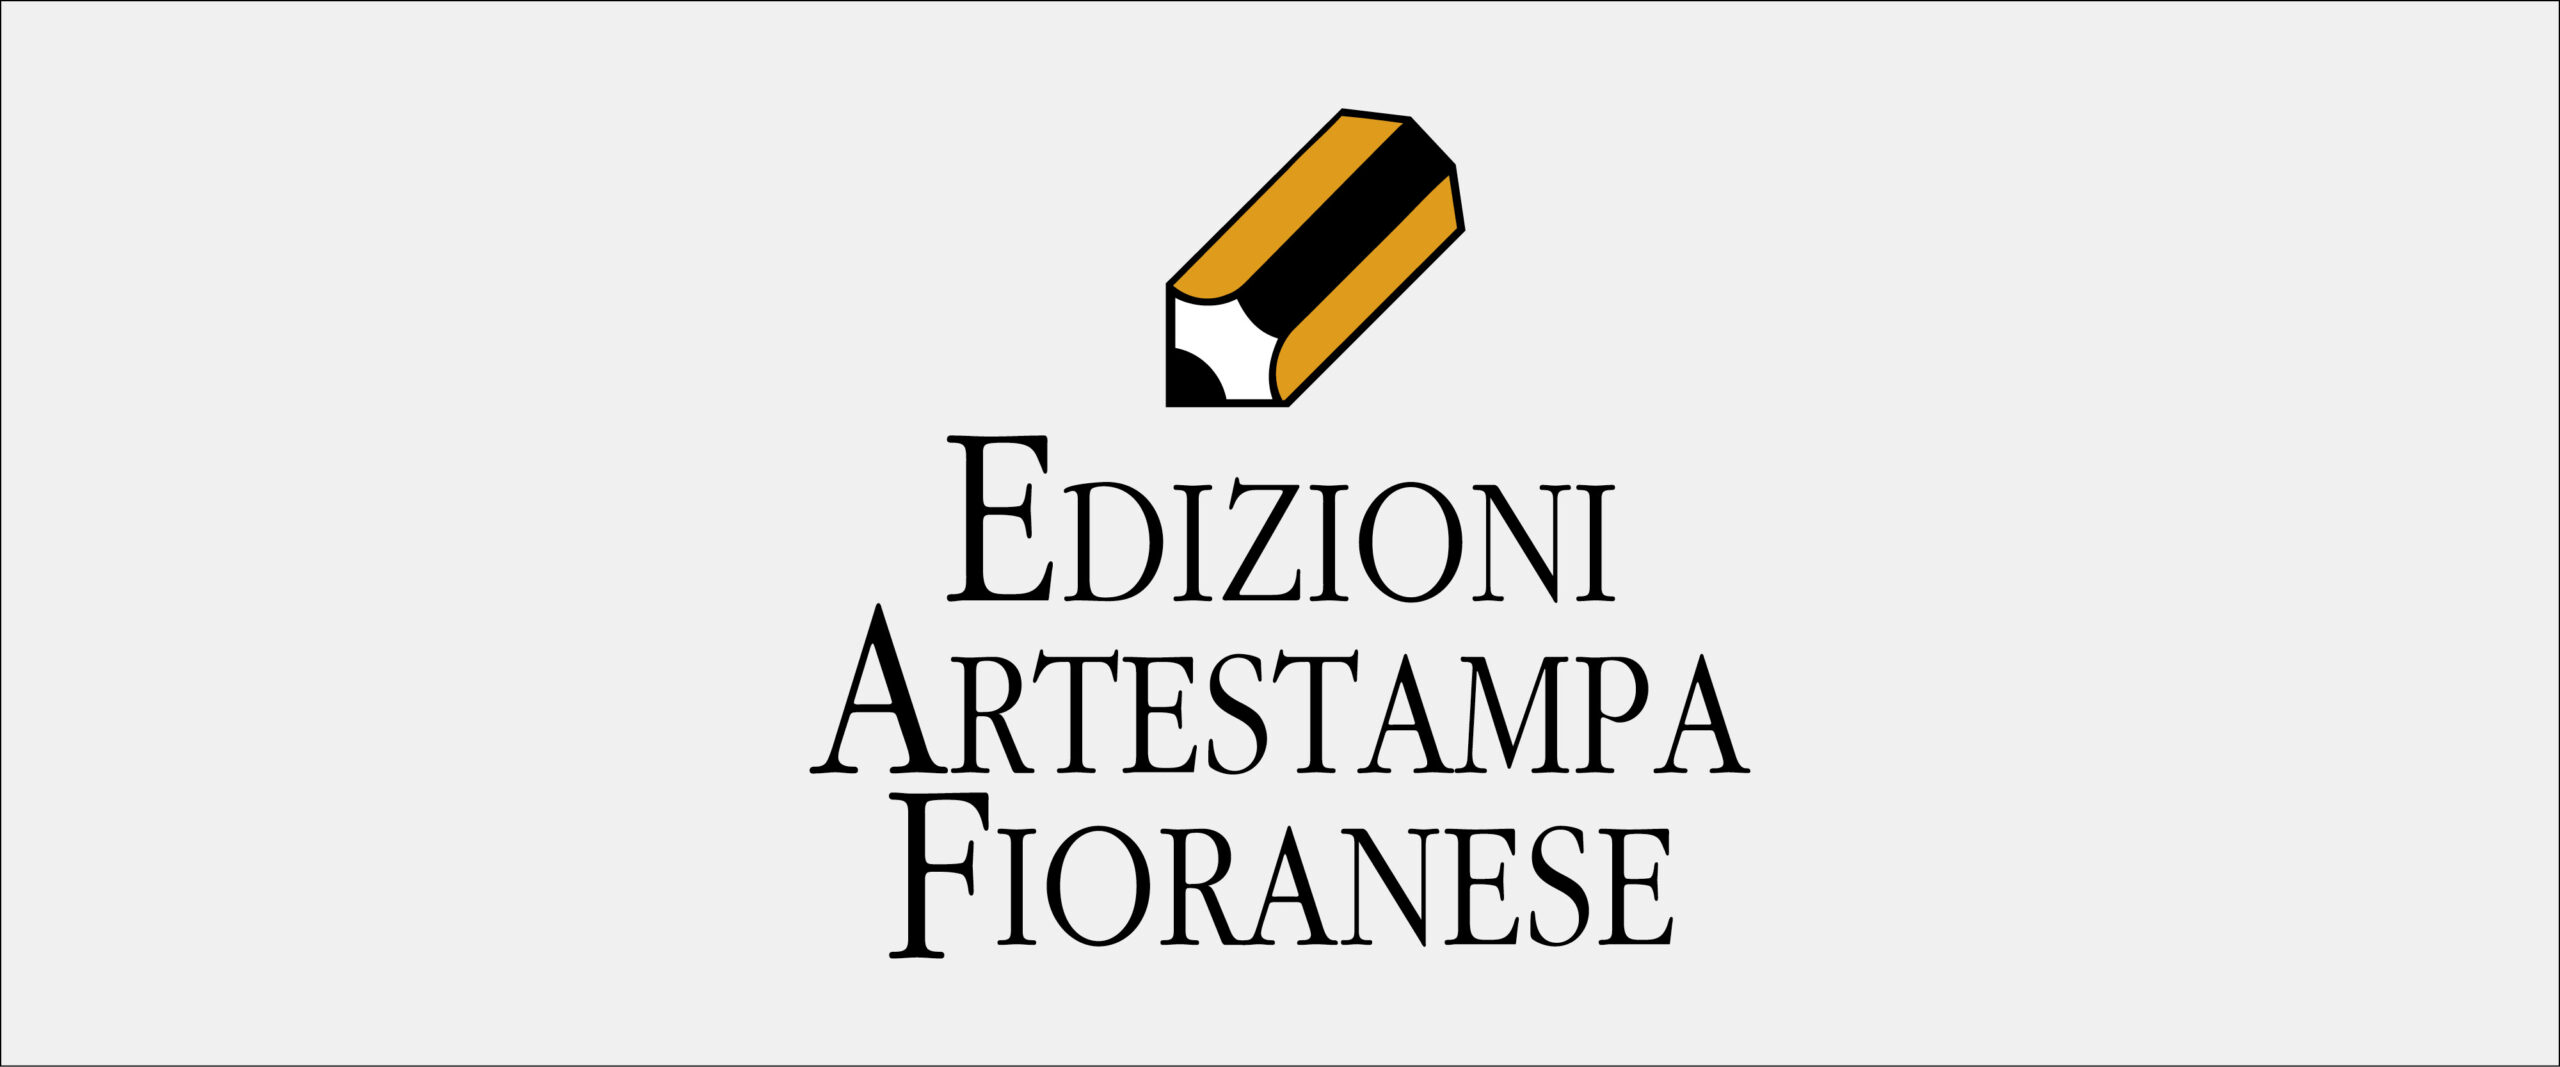 editoria artestampa fioranese